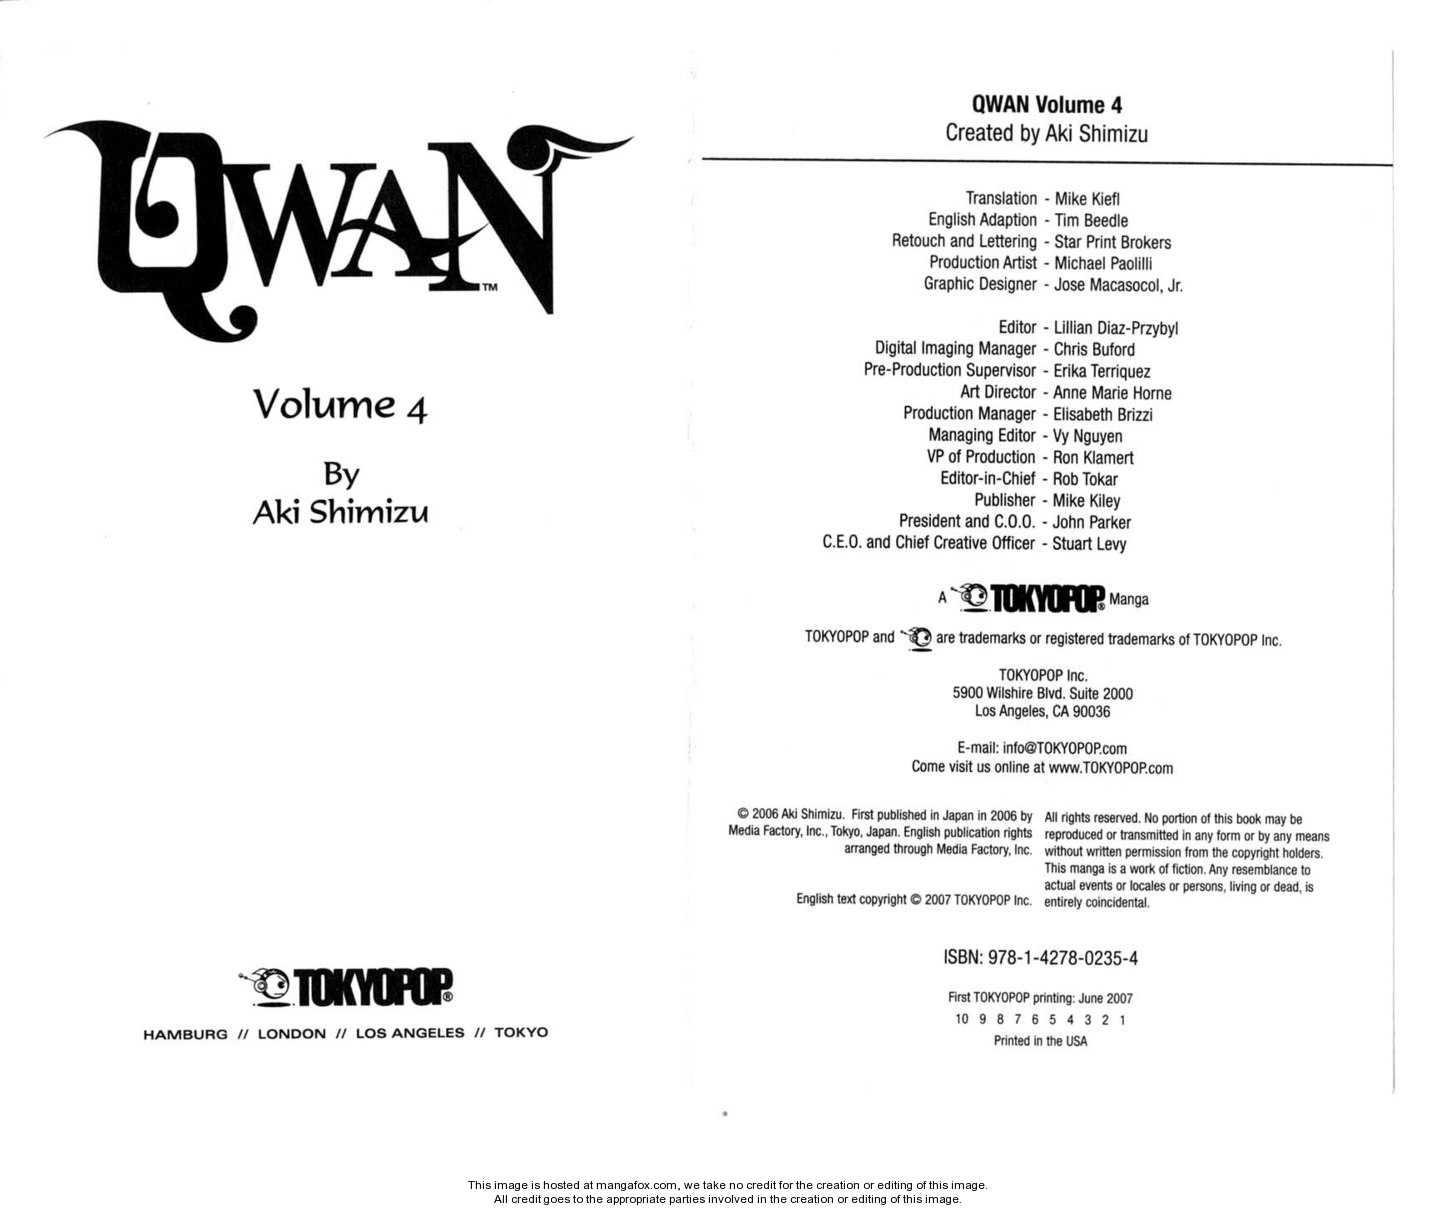 Qwan 0 Page 3